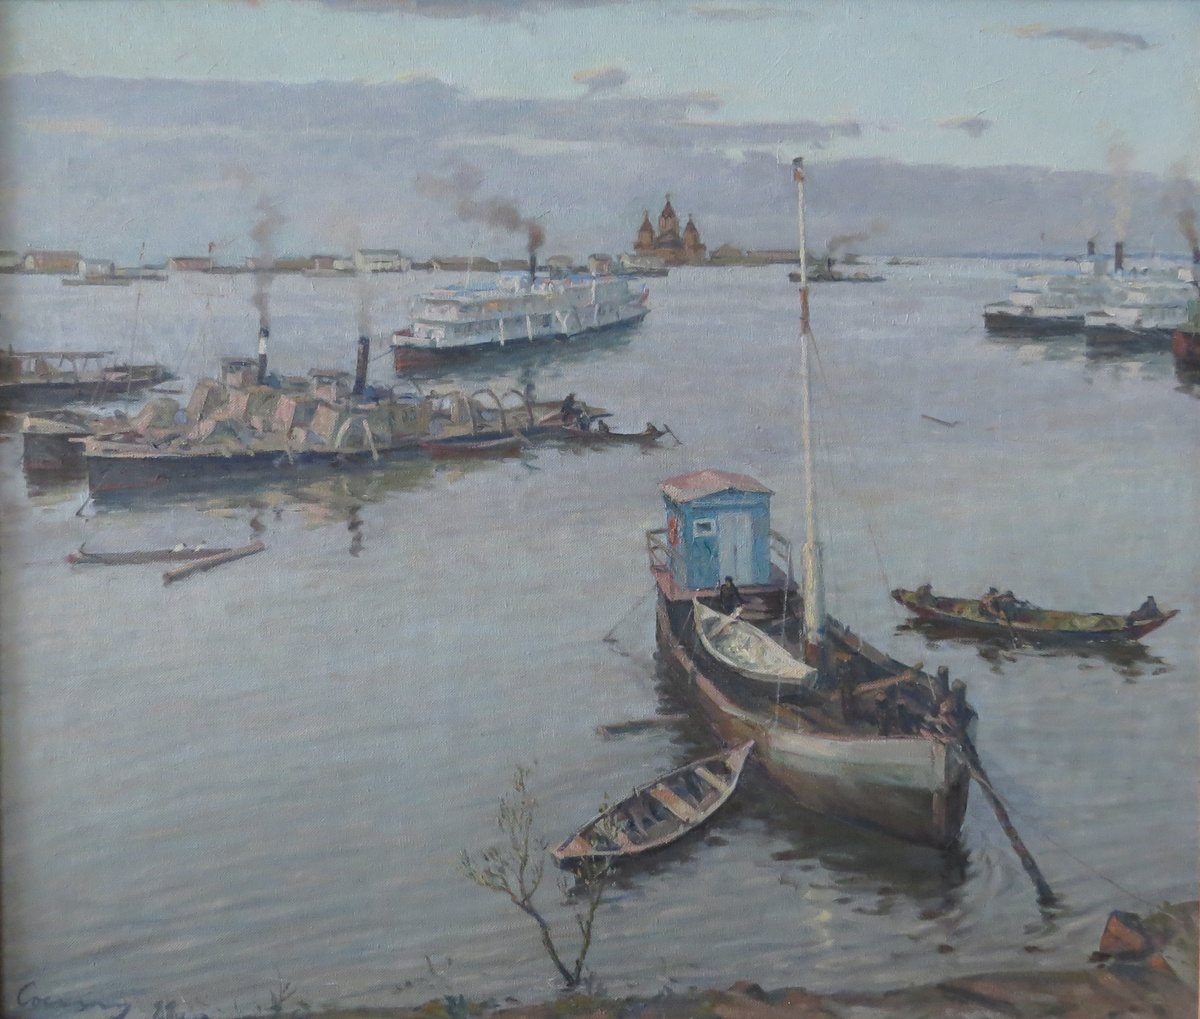 Персональная выставка Рудольфа Соснина